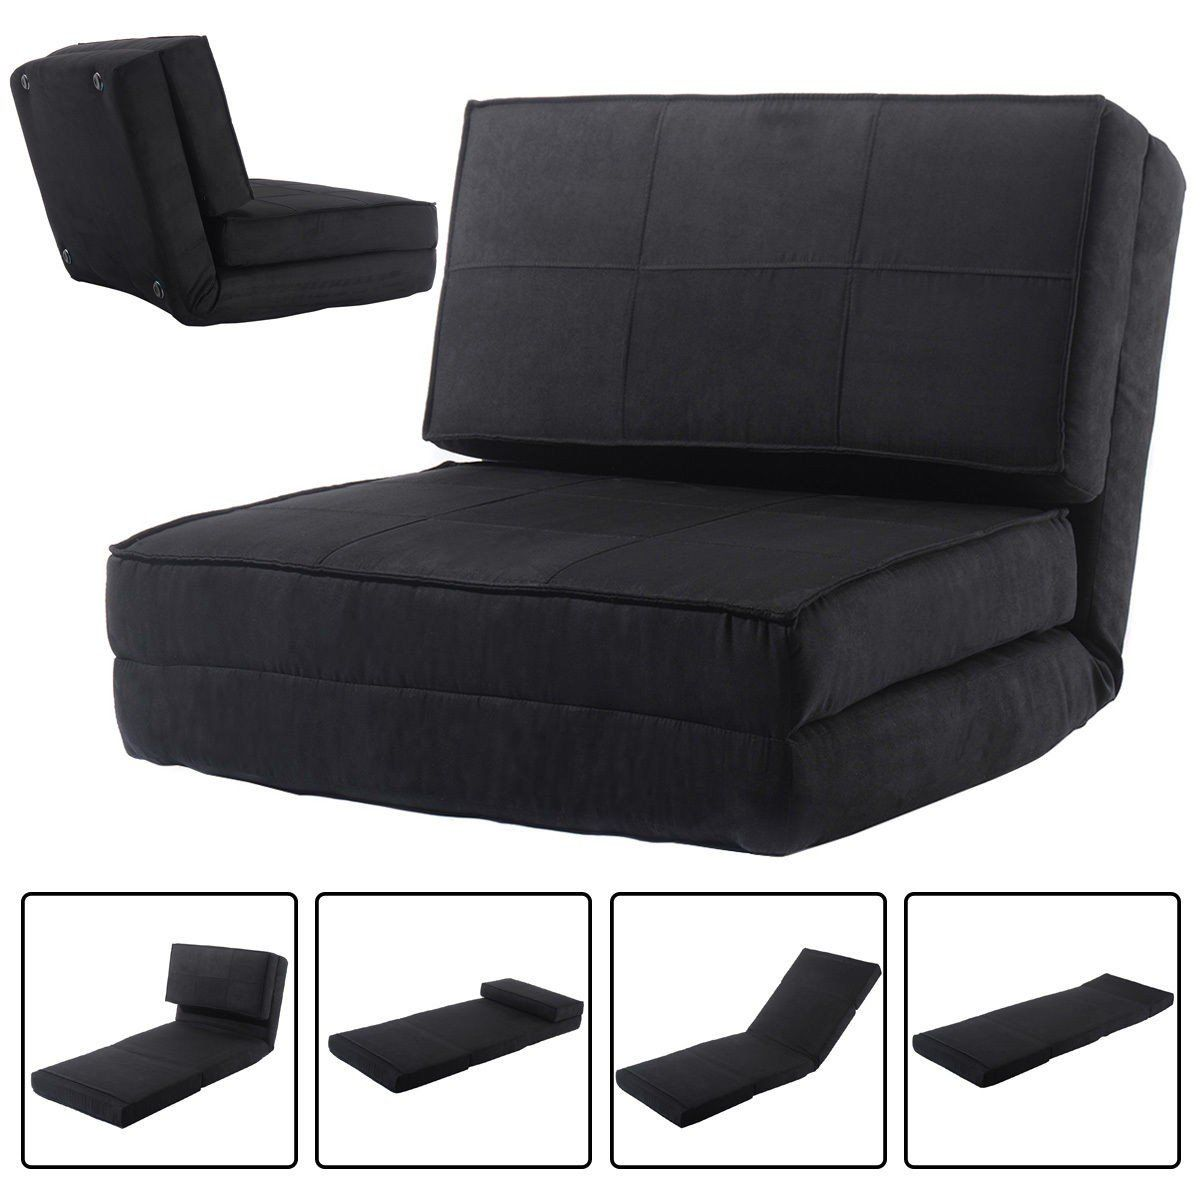 Futon Sofa Bed Furniture GRAY Sleeper Lounger Convertible Low Seat Microfiber